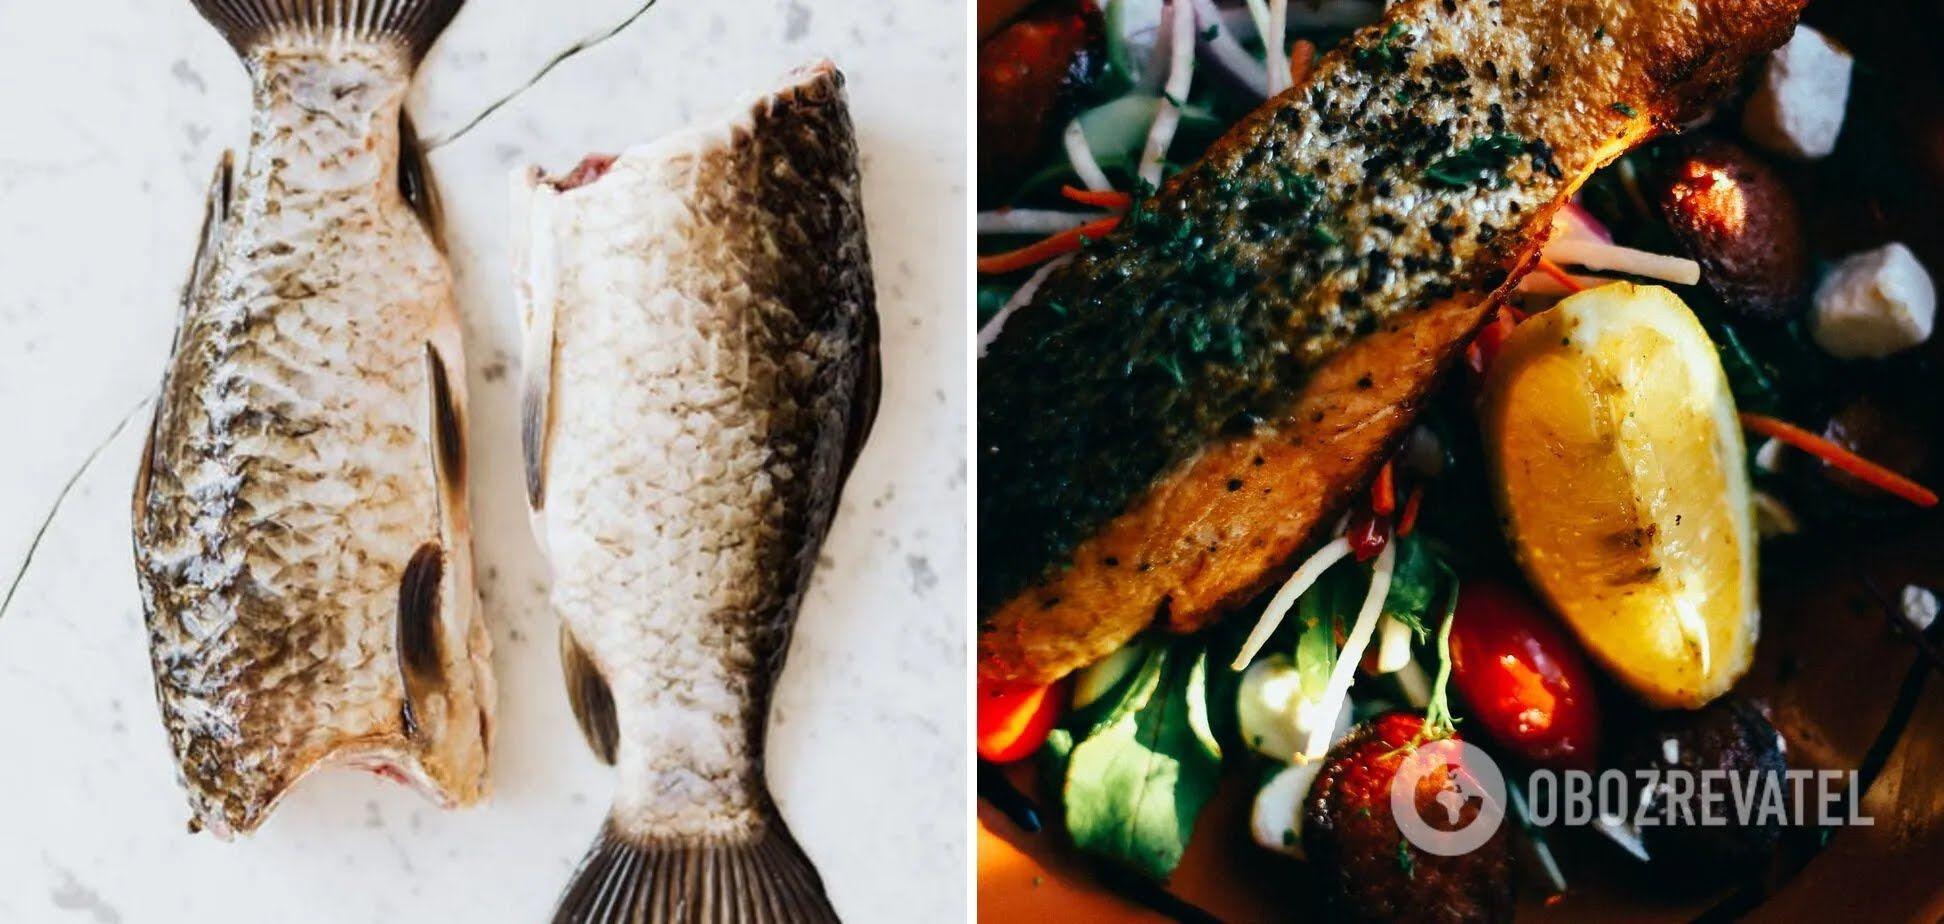 Як смачно приготувати рибу на вечерю